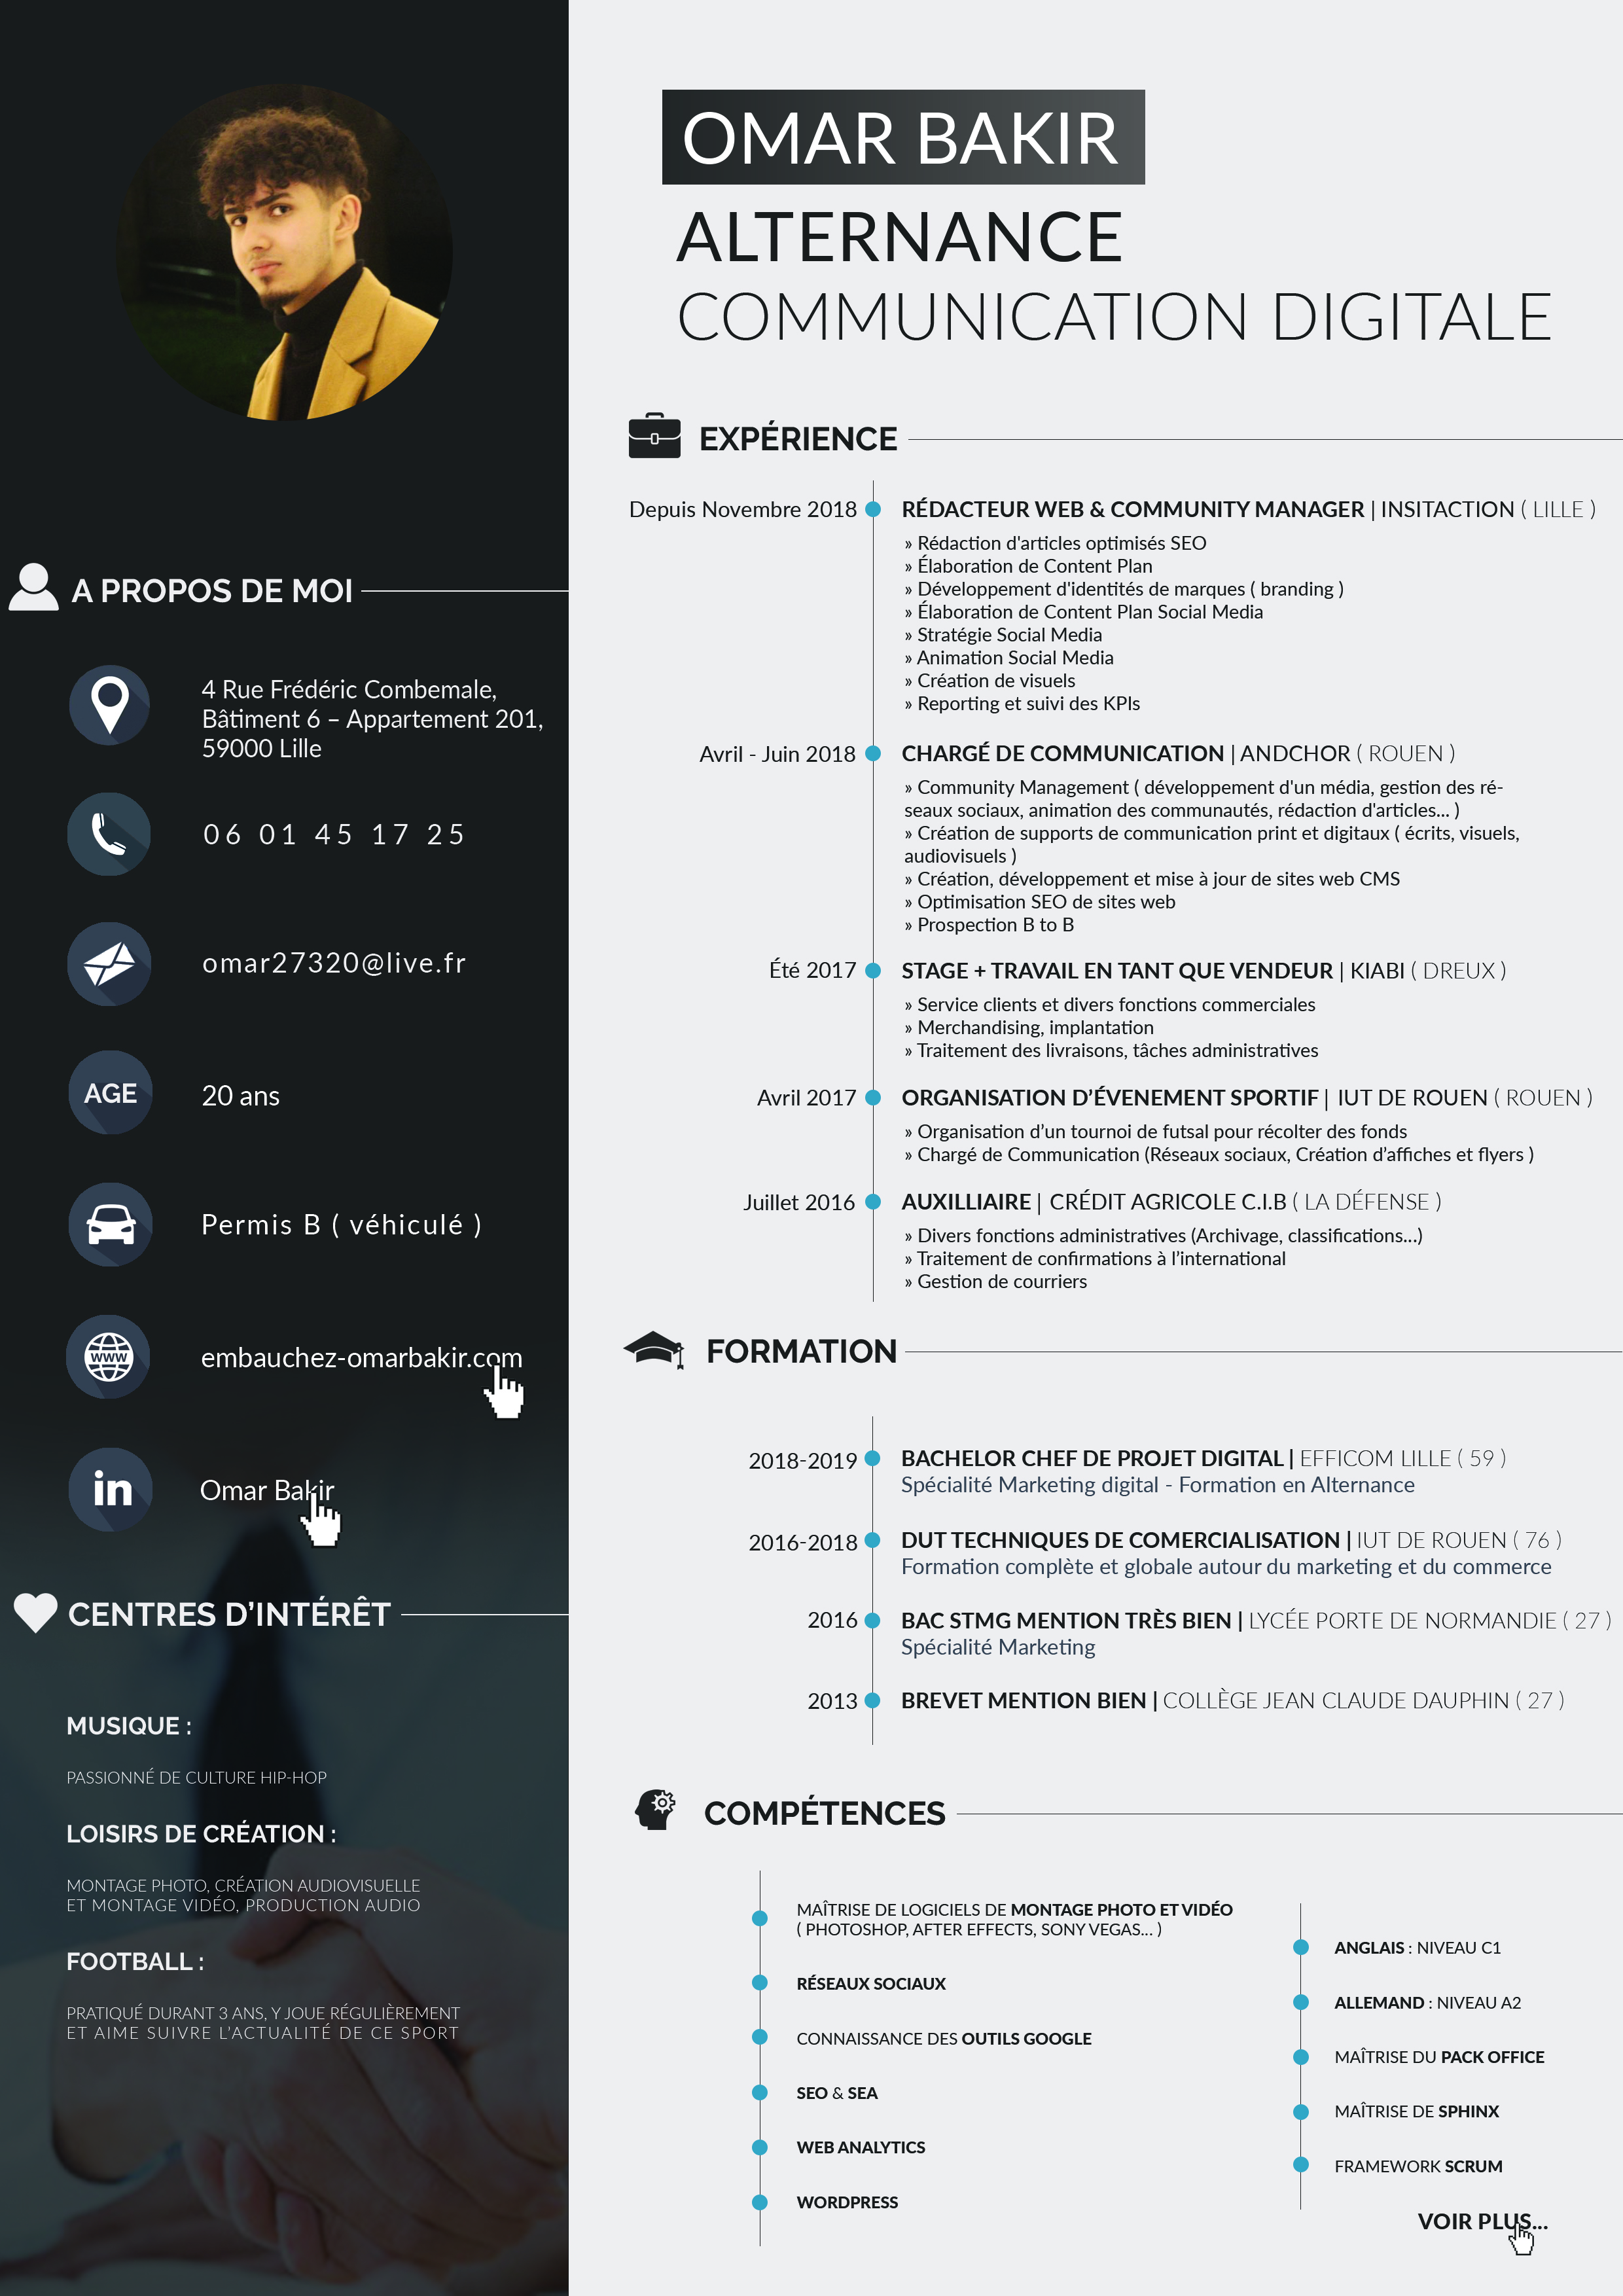 CV Omar Bakir - Alternance Communication et Marketing digital 2019